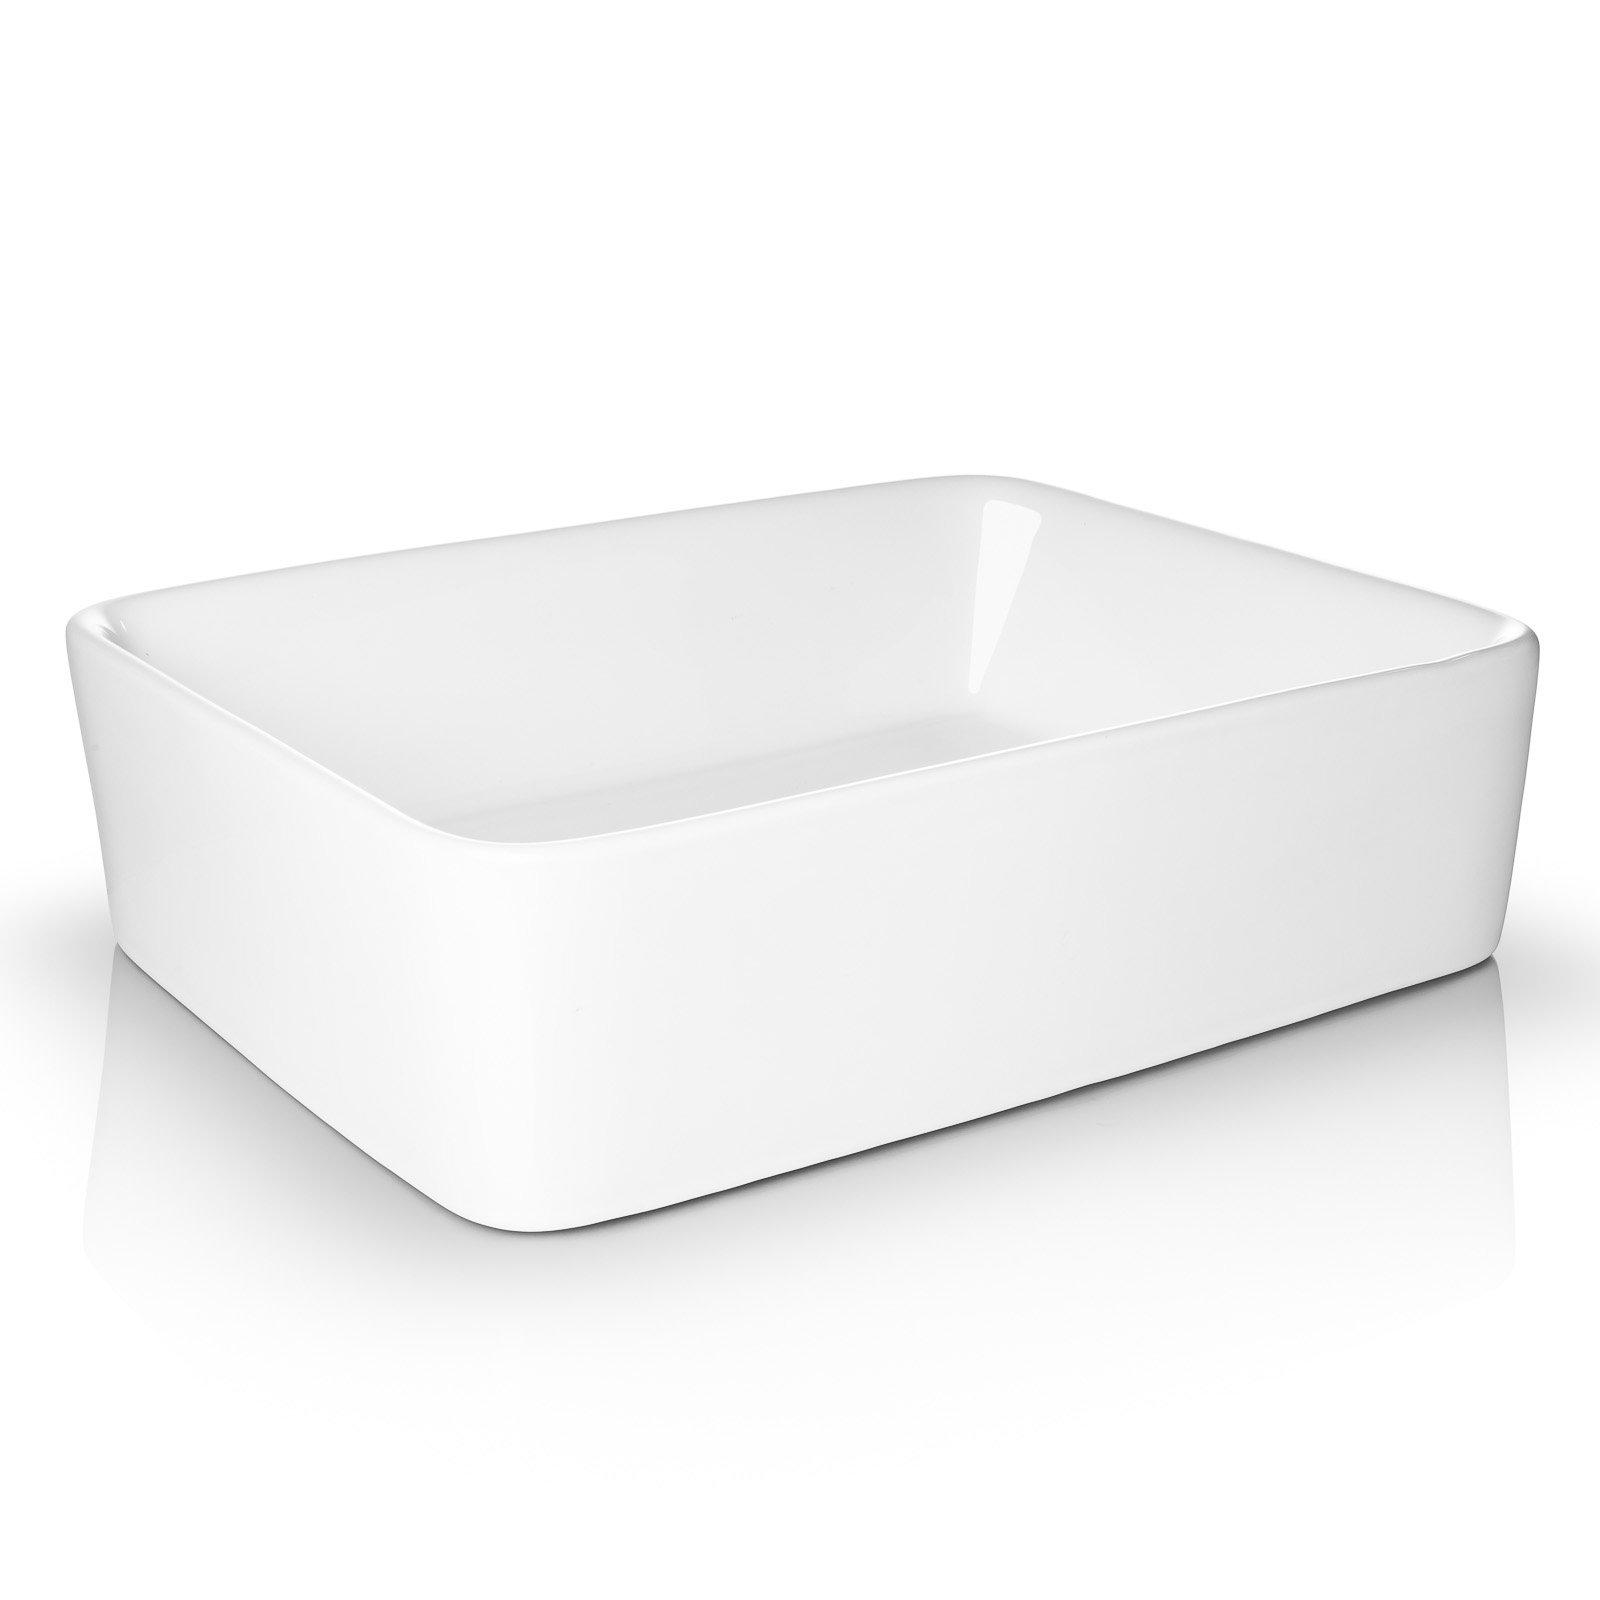 Miligoré 19'' x 15'' Rectangular White Ceramic Vessel Sink - Modern Above Counter Bathroom Vanity Bowl by Miligoré